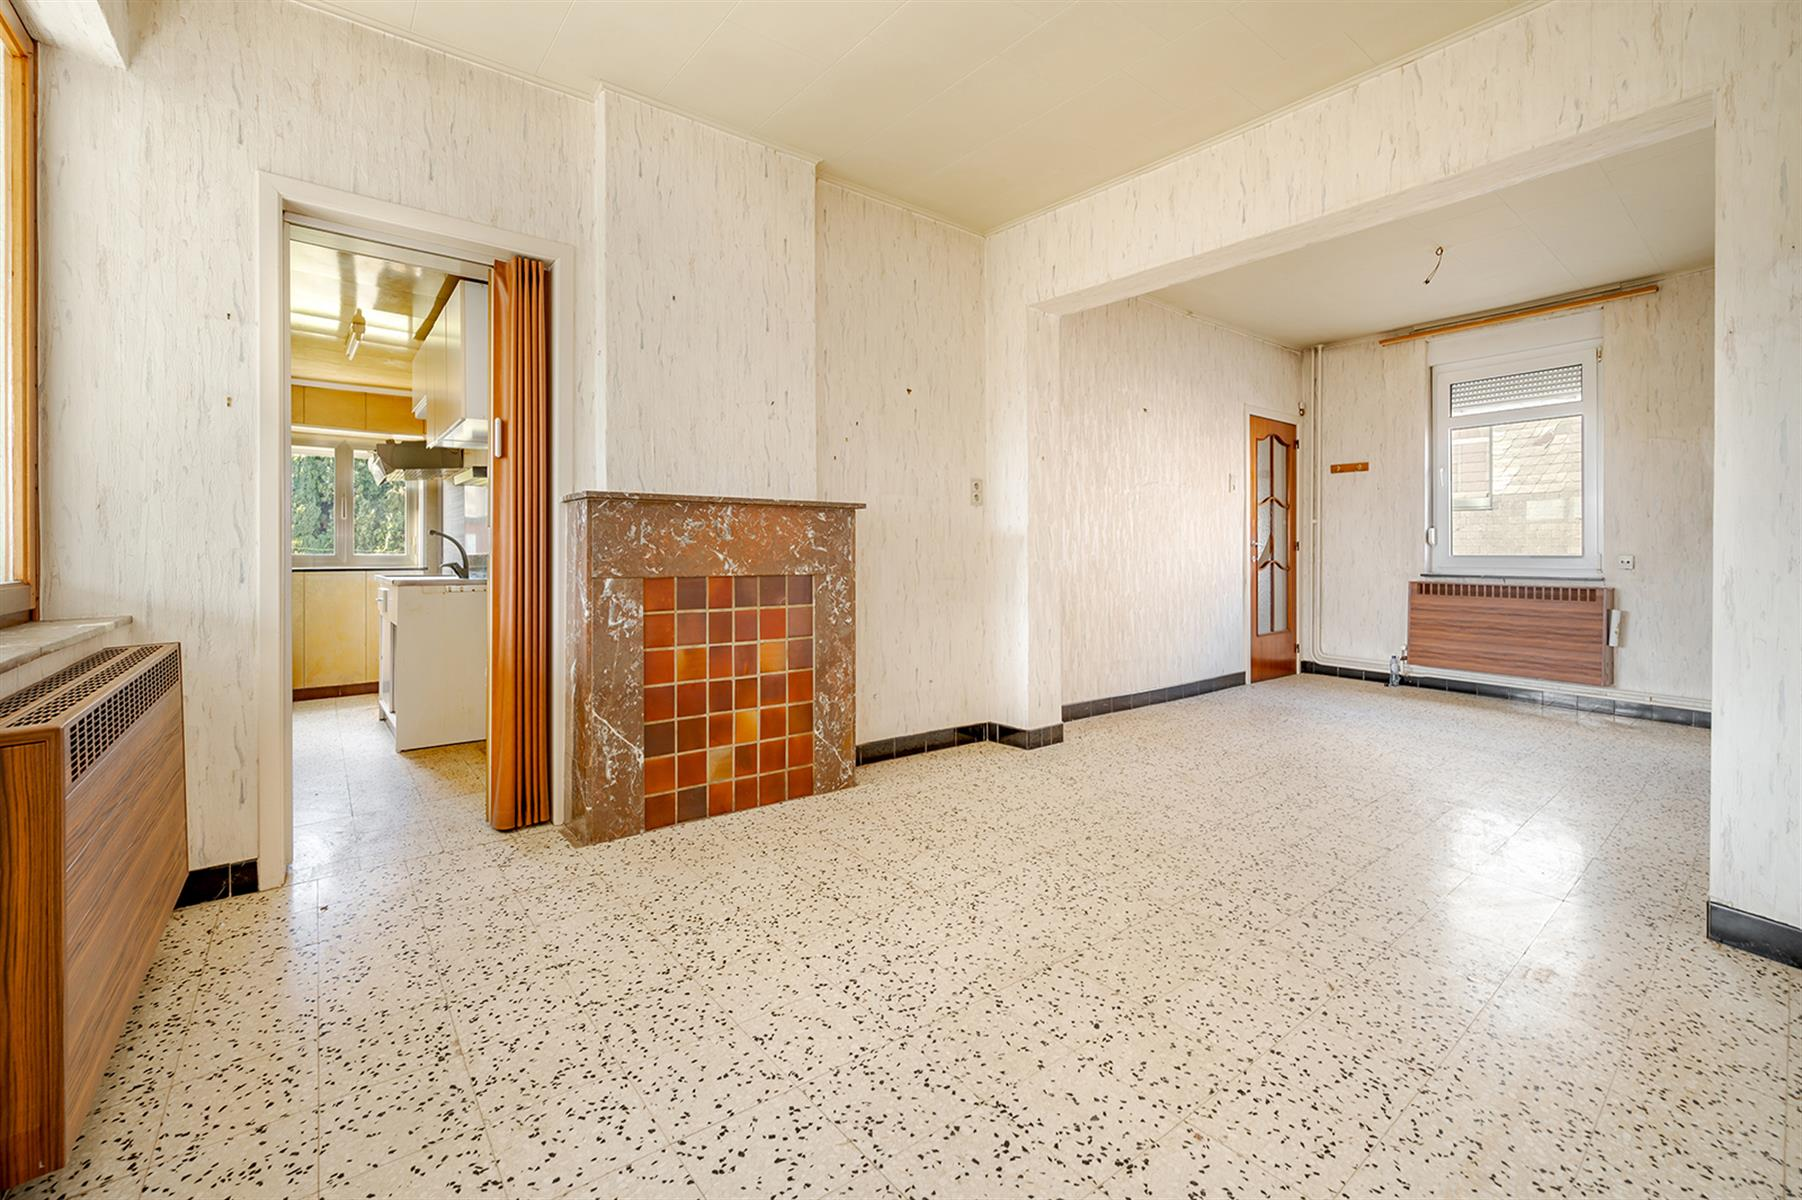 Maison - Remicourt - #4293207-4